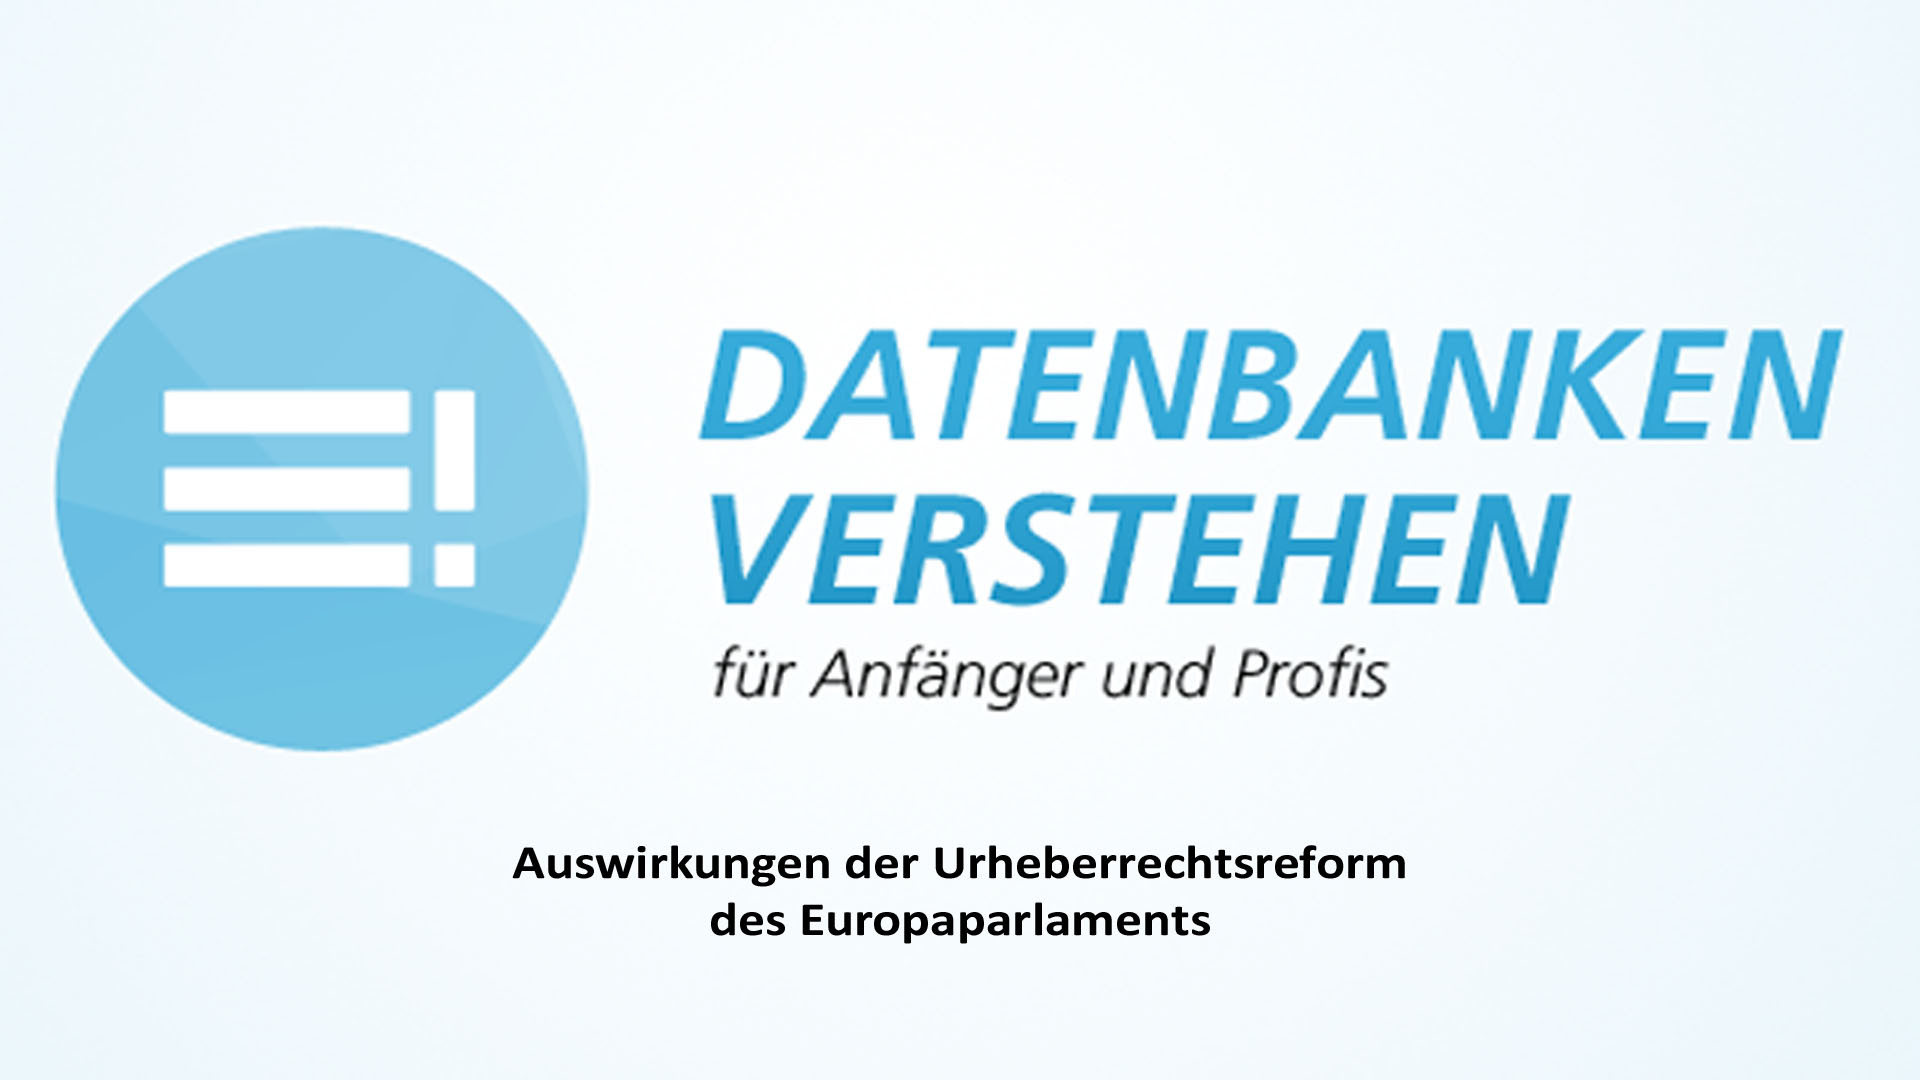 Auswirkungen der Urheberrechtsreform des Europaparlaments | Datenbank Blog